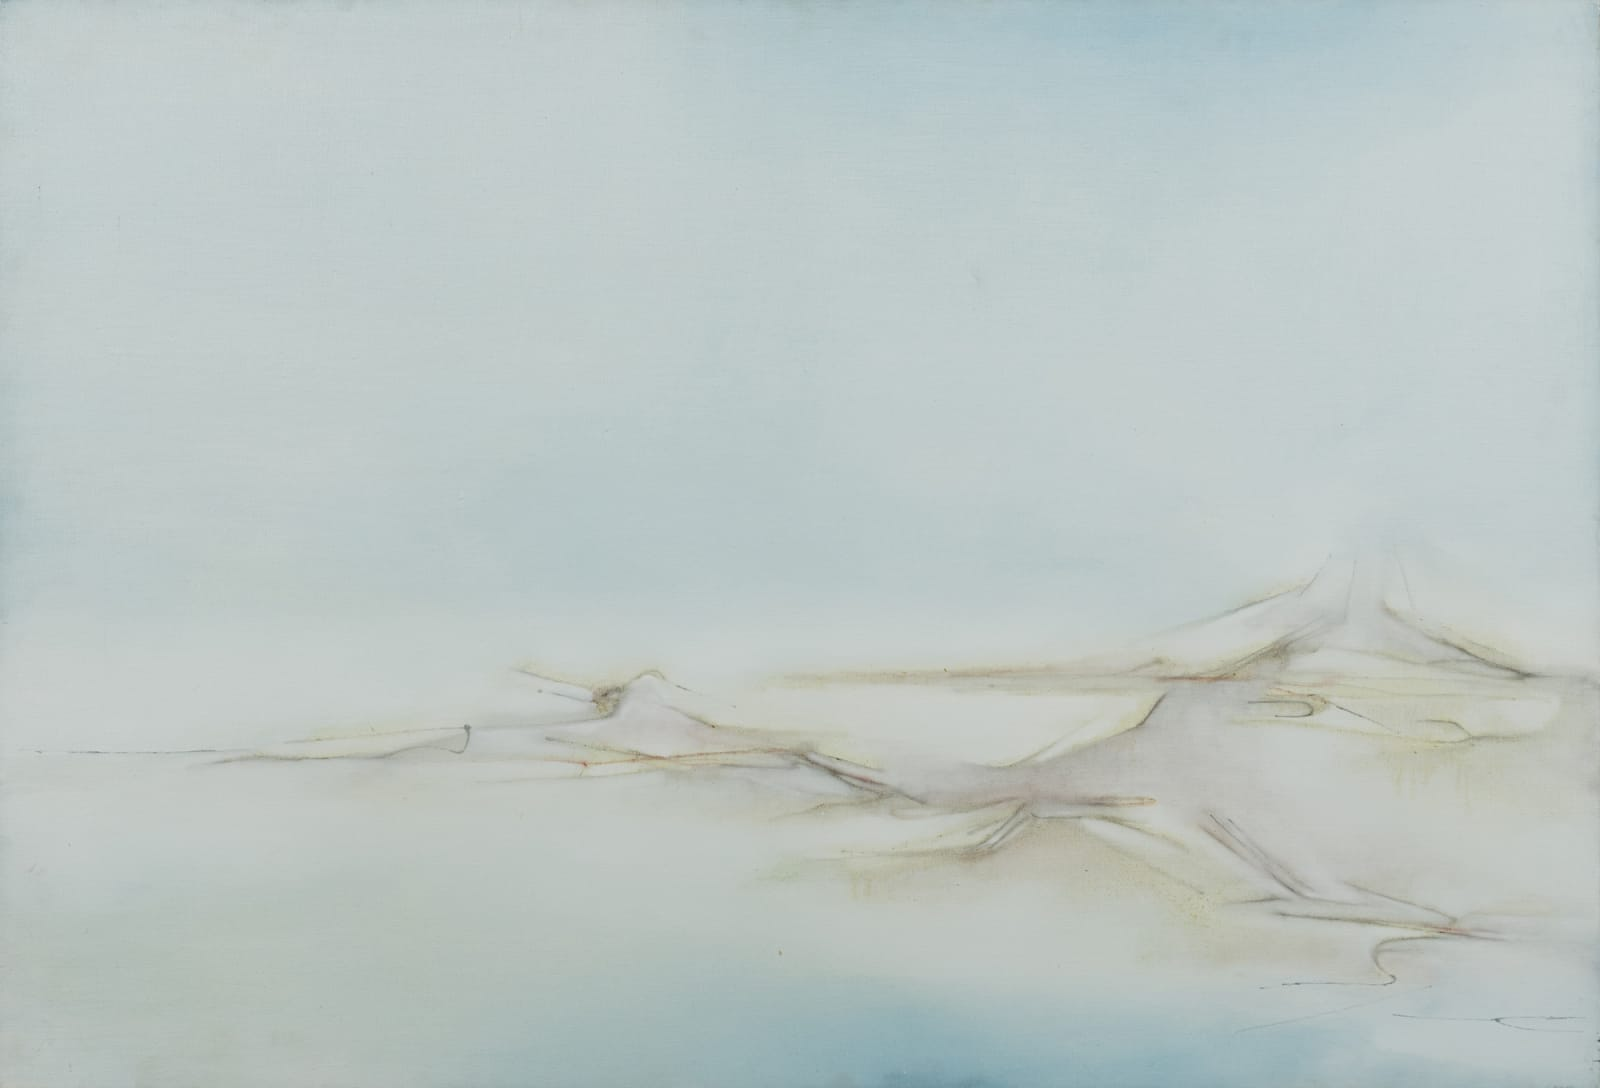 Lalan 謝景蘭, Somewhere《某處》, 1977